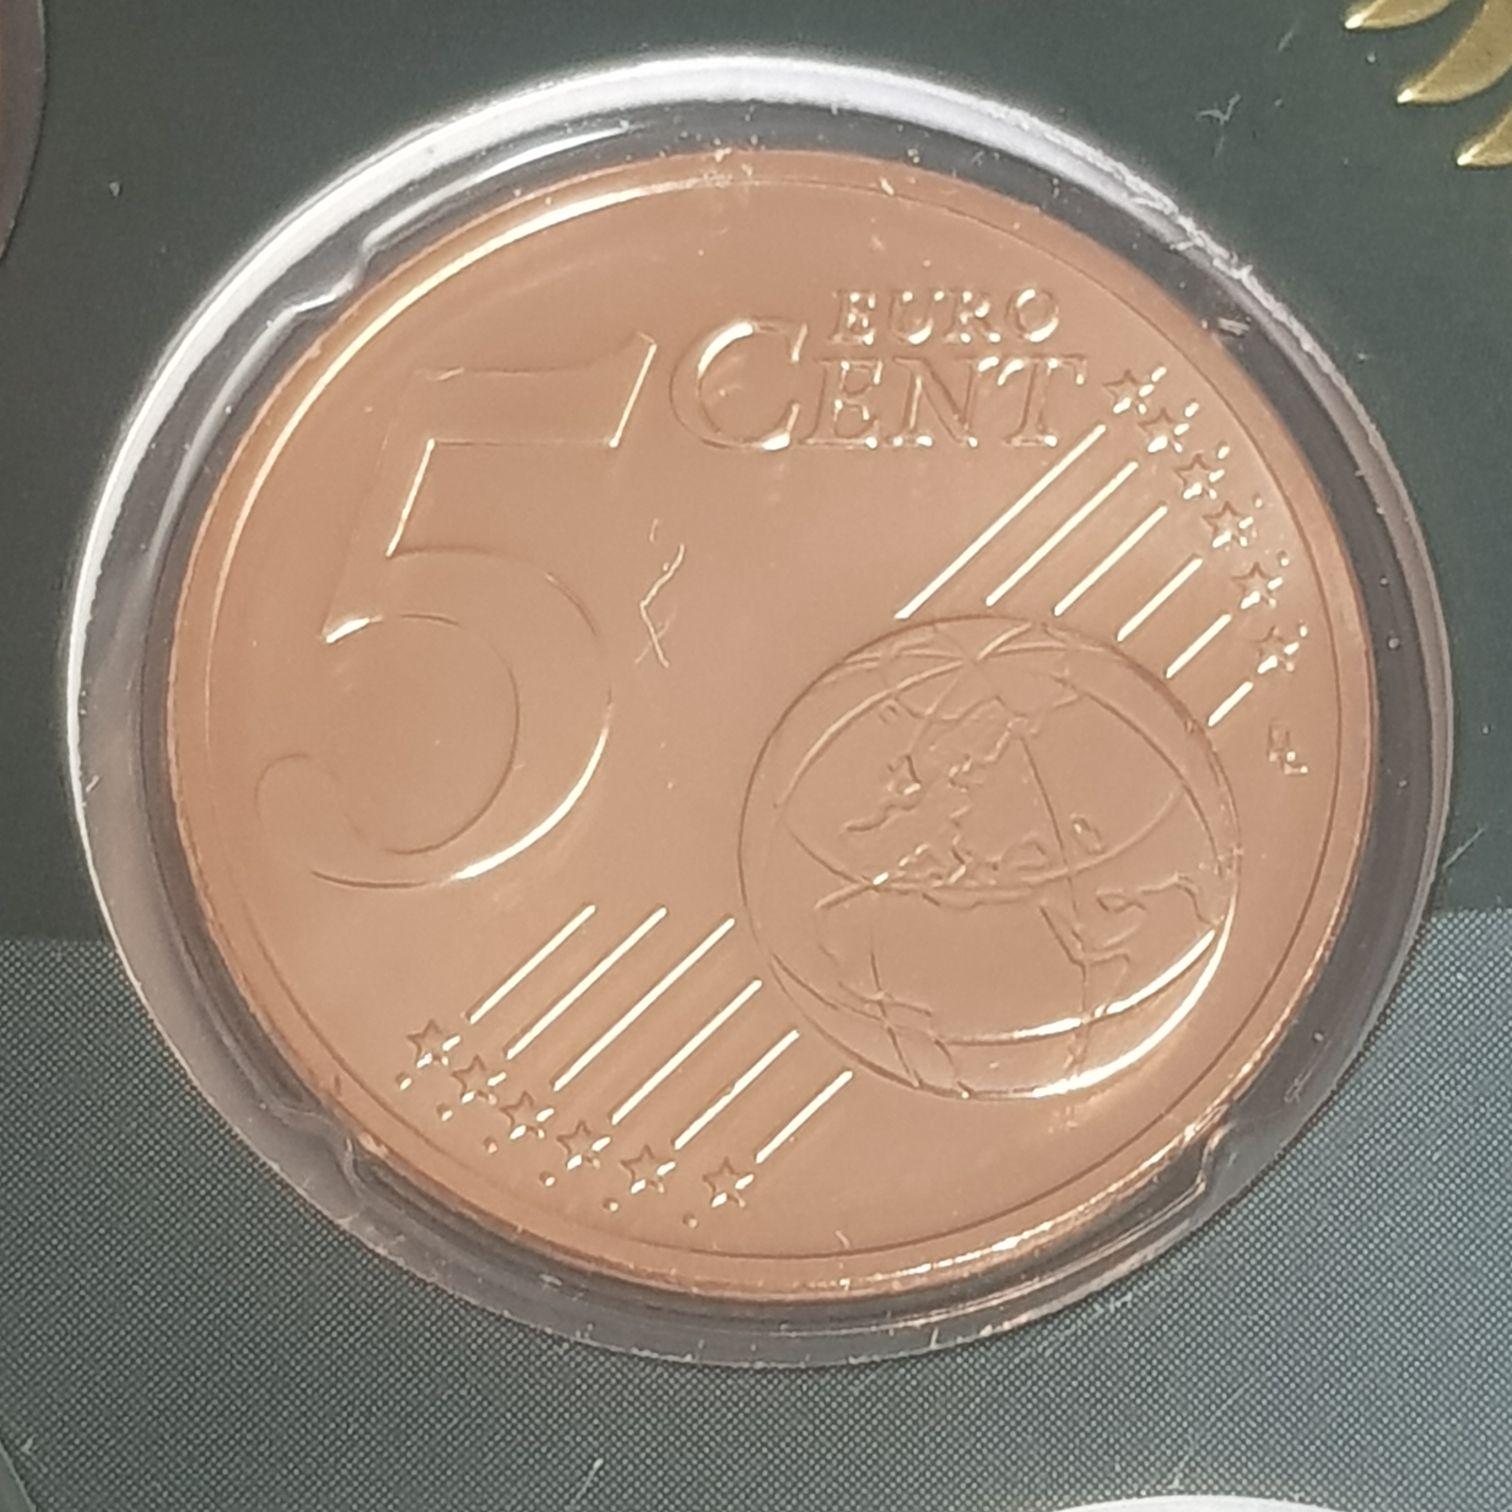 .05 Centavos De Euro Coin - $.05 (2017) front image (front cover)